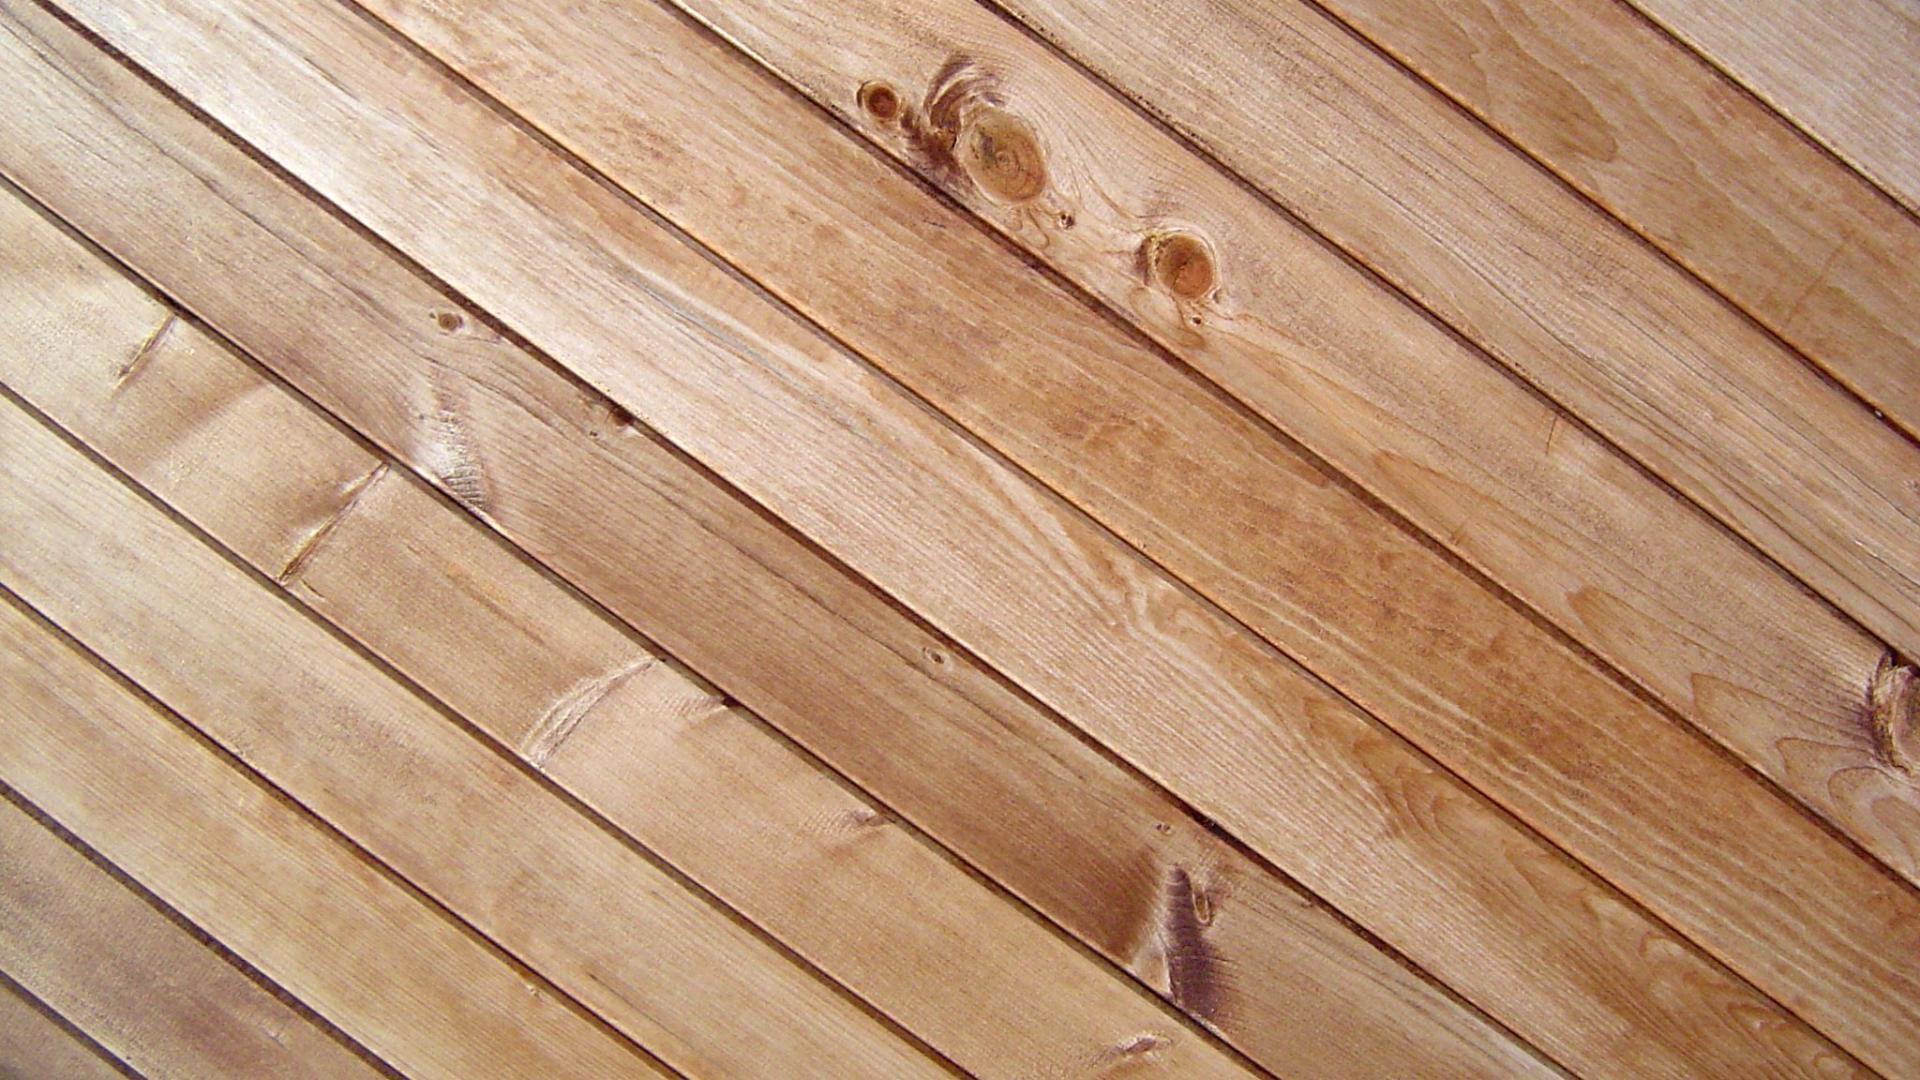 Wood Grain Desktop Wallpapers Wallpaper | HD Wallpapers | Pinterest | Wood  wallpaper, Wallpaper and Wallpaper desktop